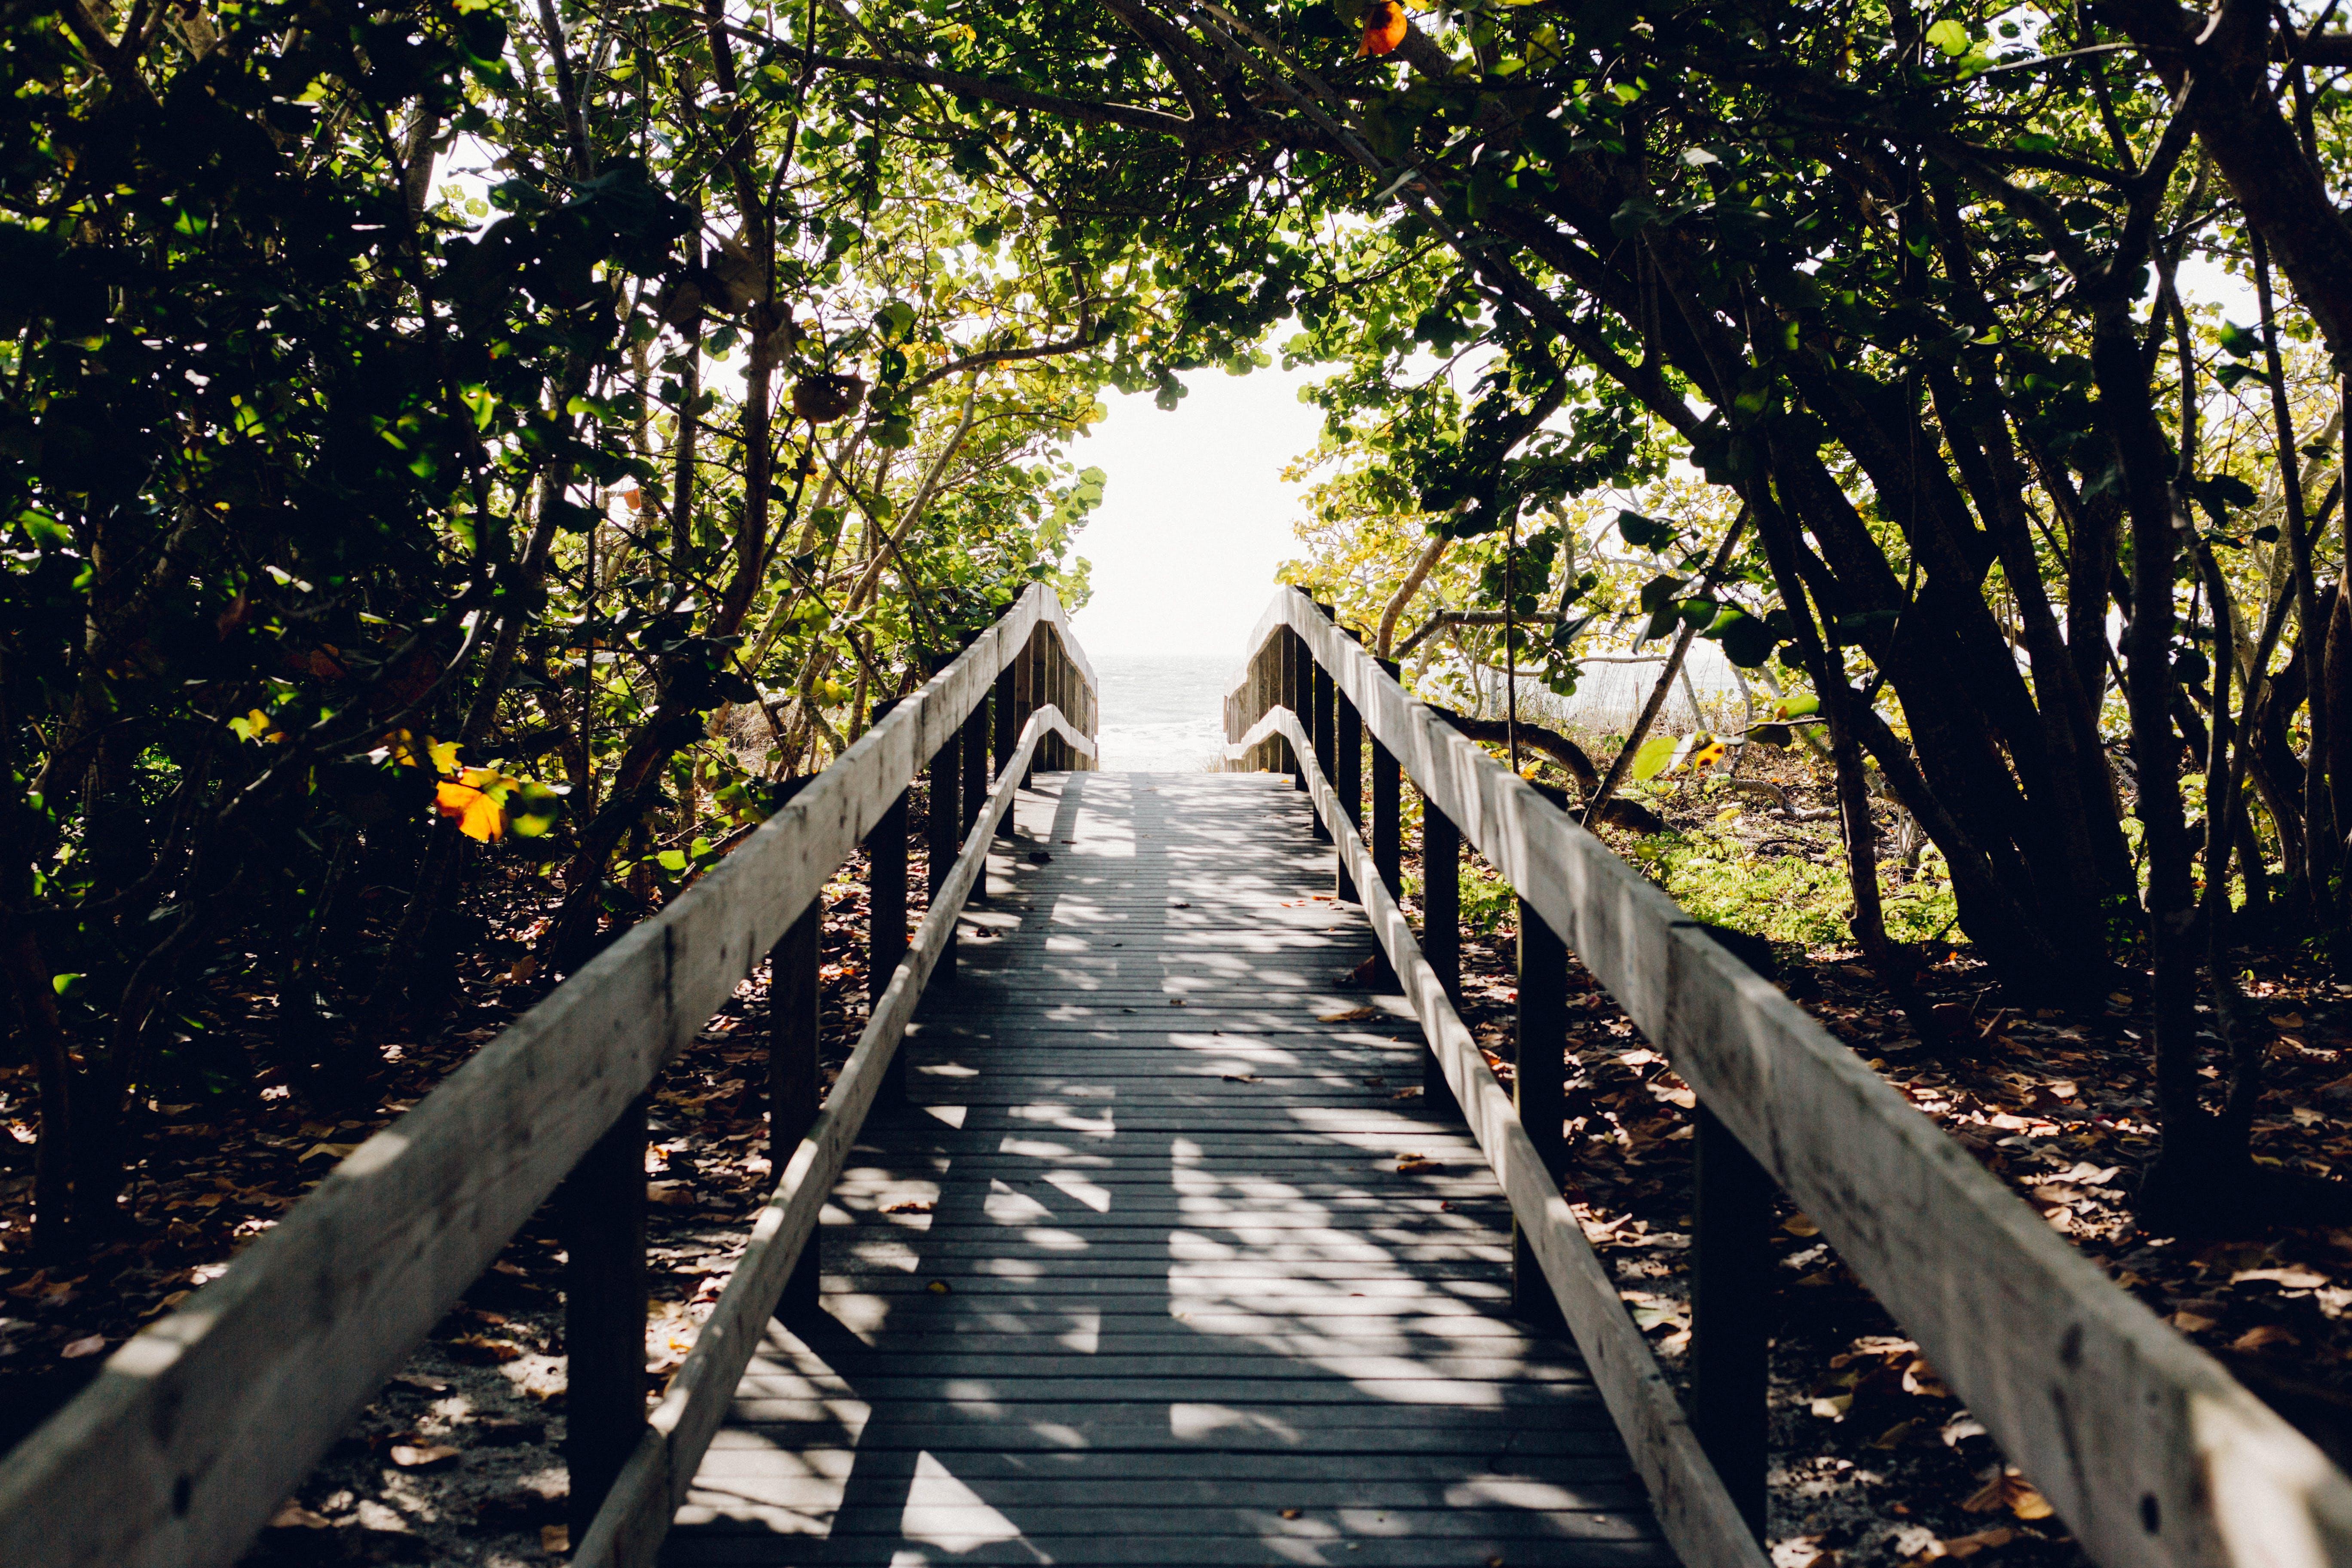 beach, boardwalk, bridge